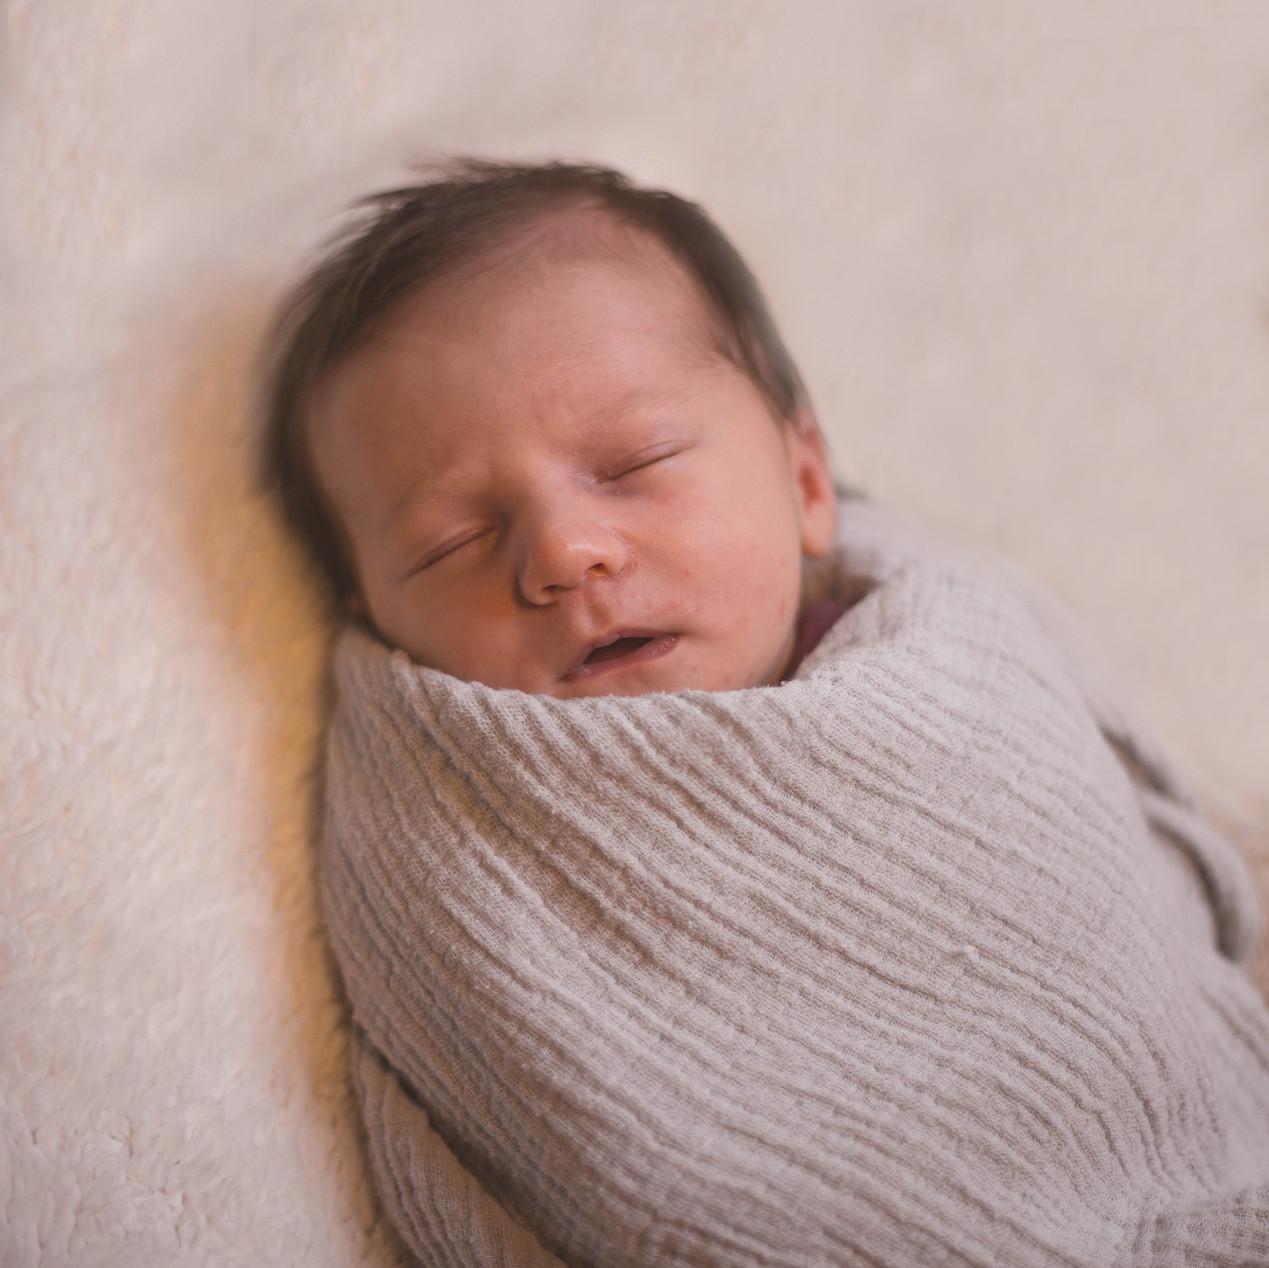 Newborn Lifestyle photograhy session